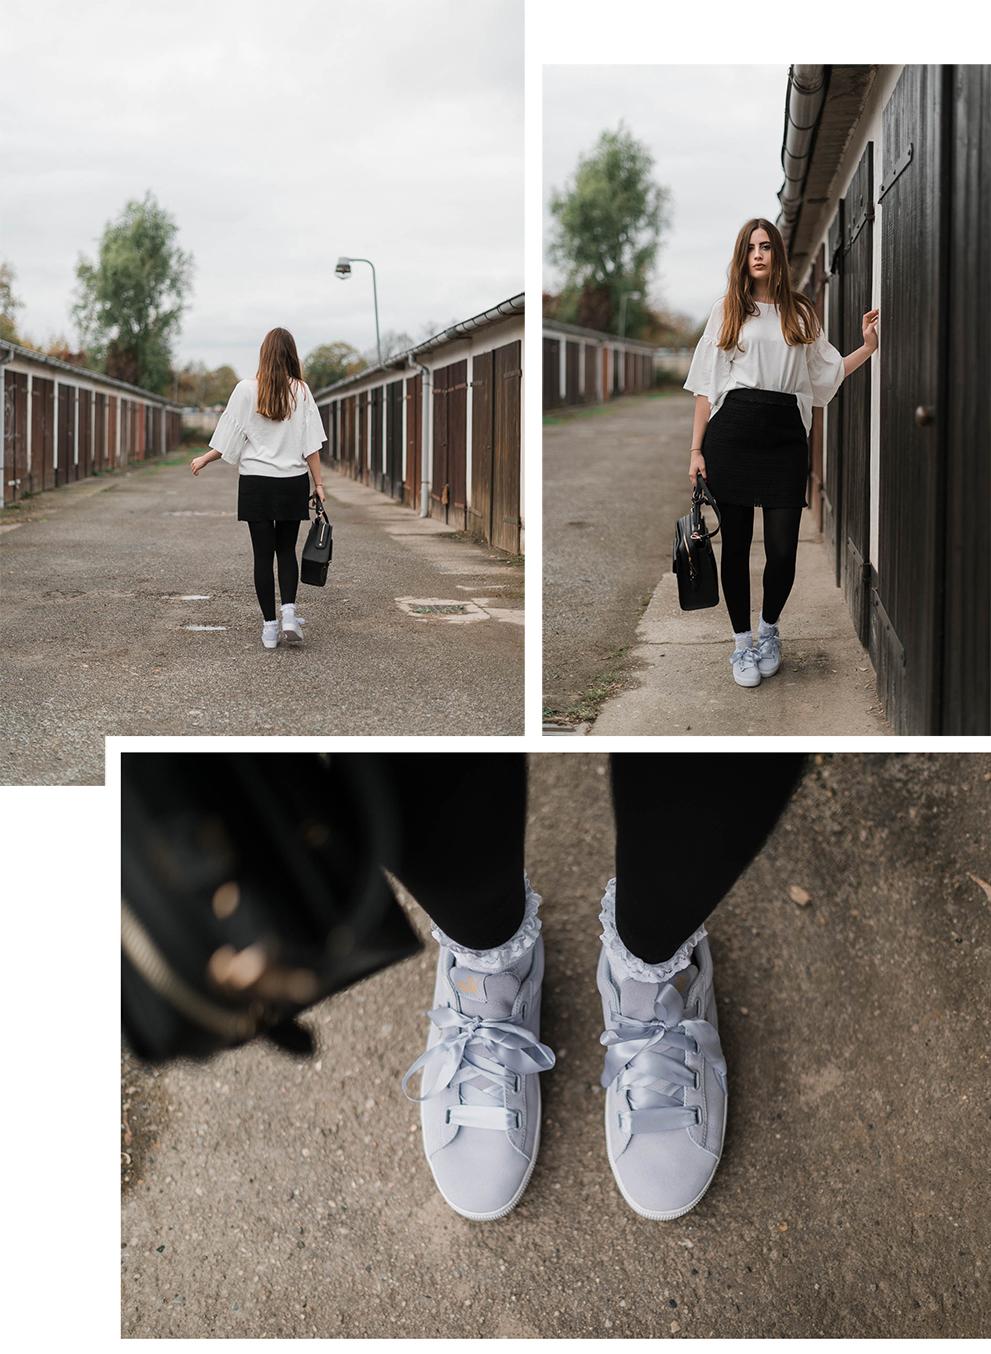 andsparkles-Modeblog Berlin-Deichmann Shoelove-Monatsrückblick im Oktober